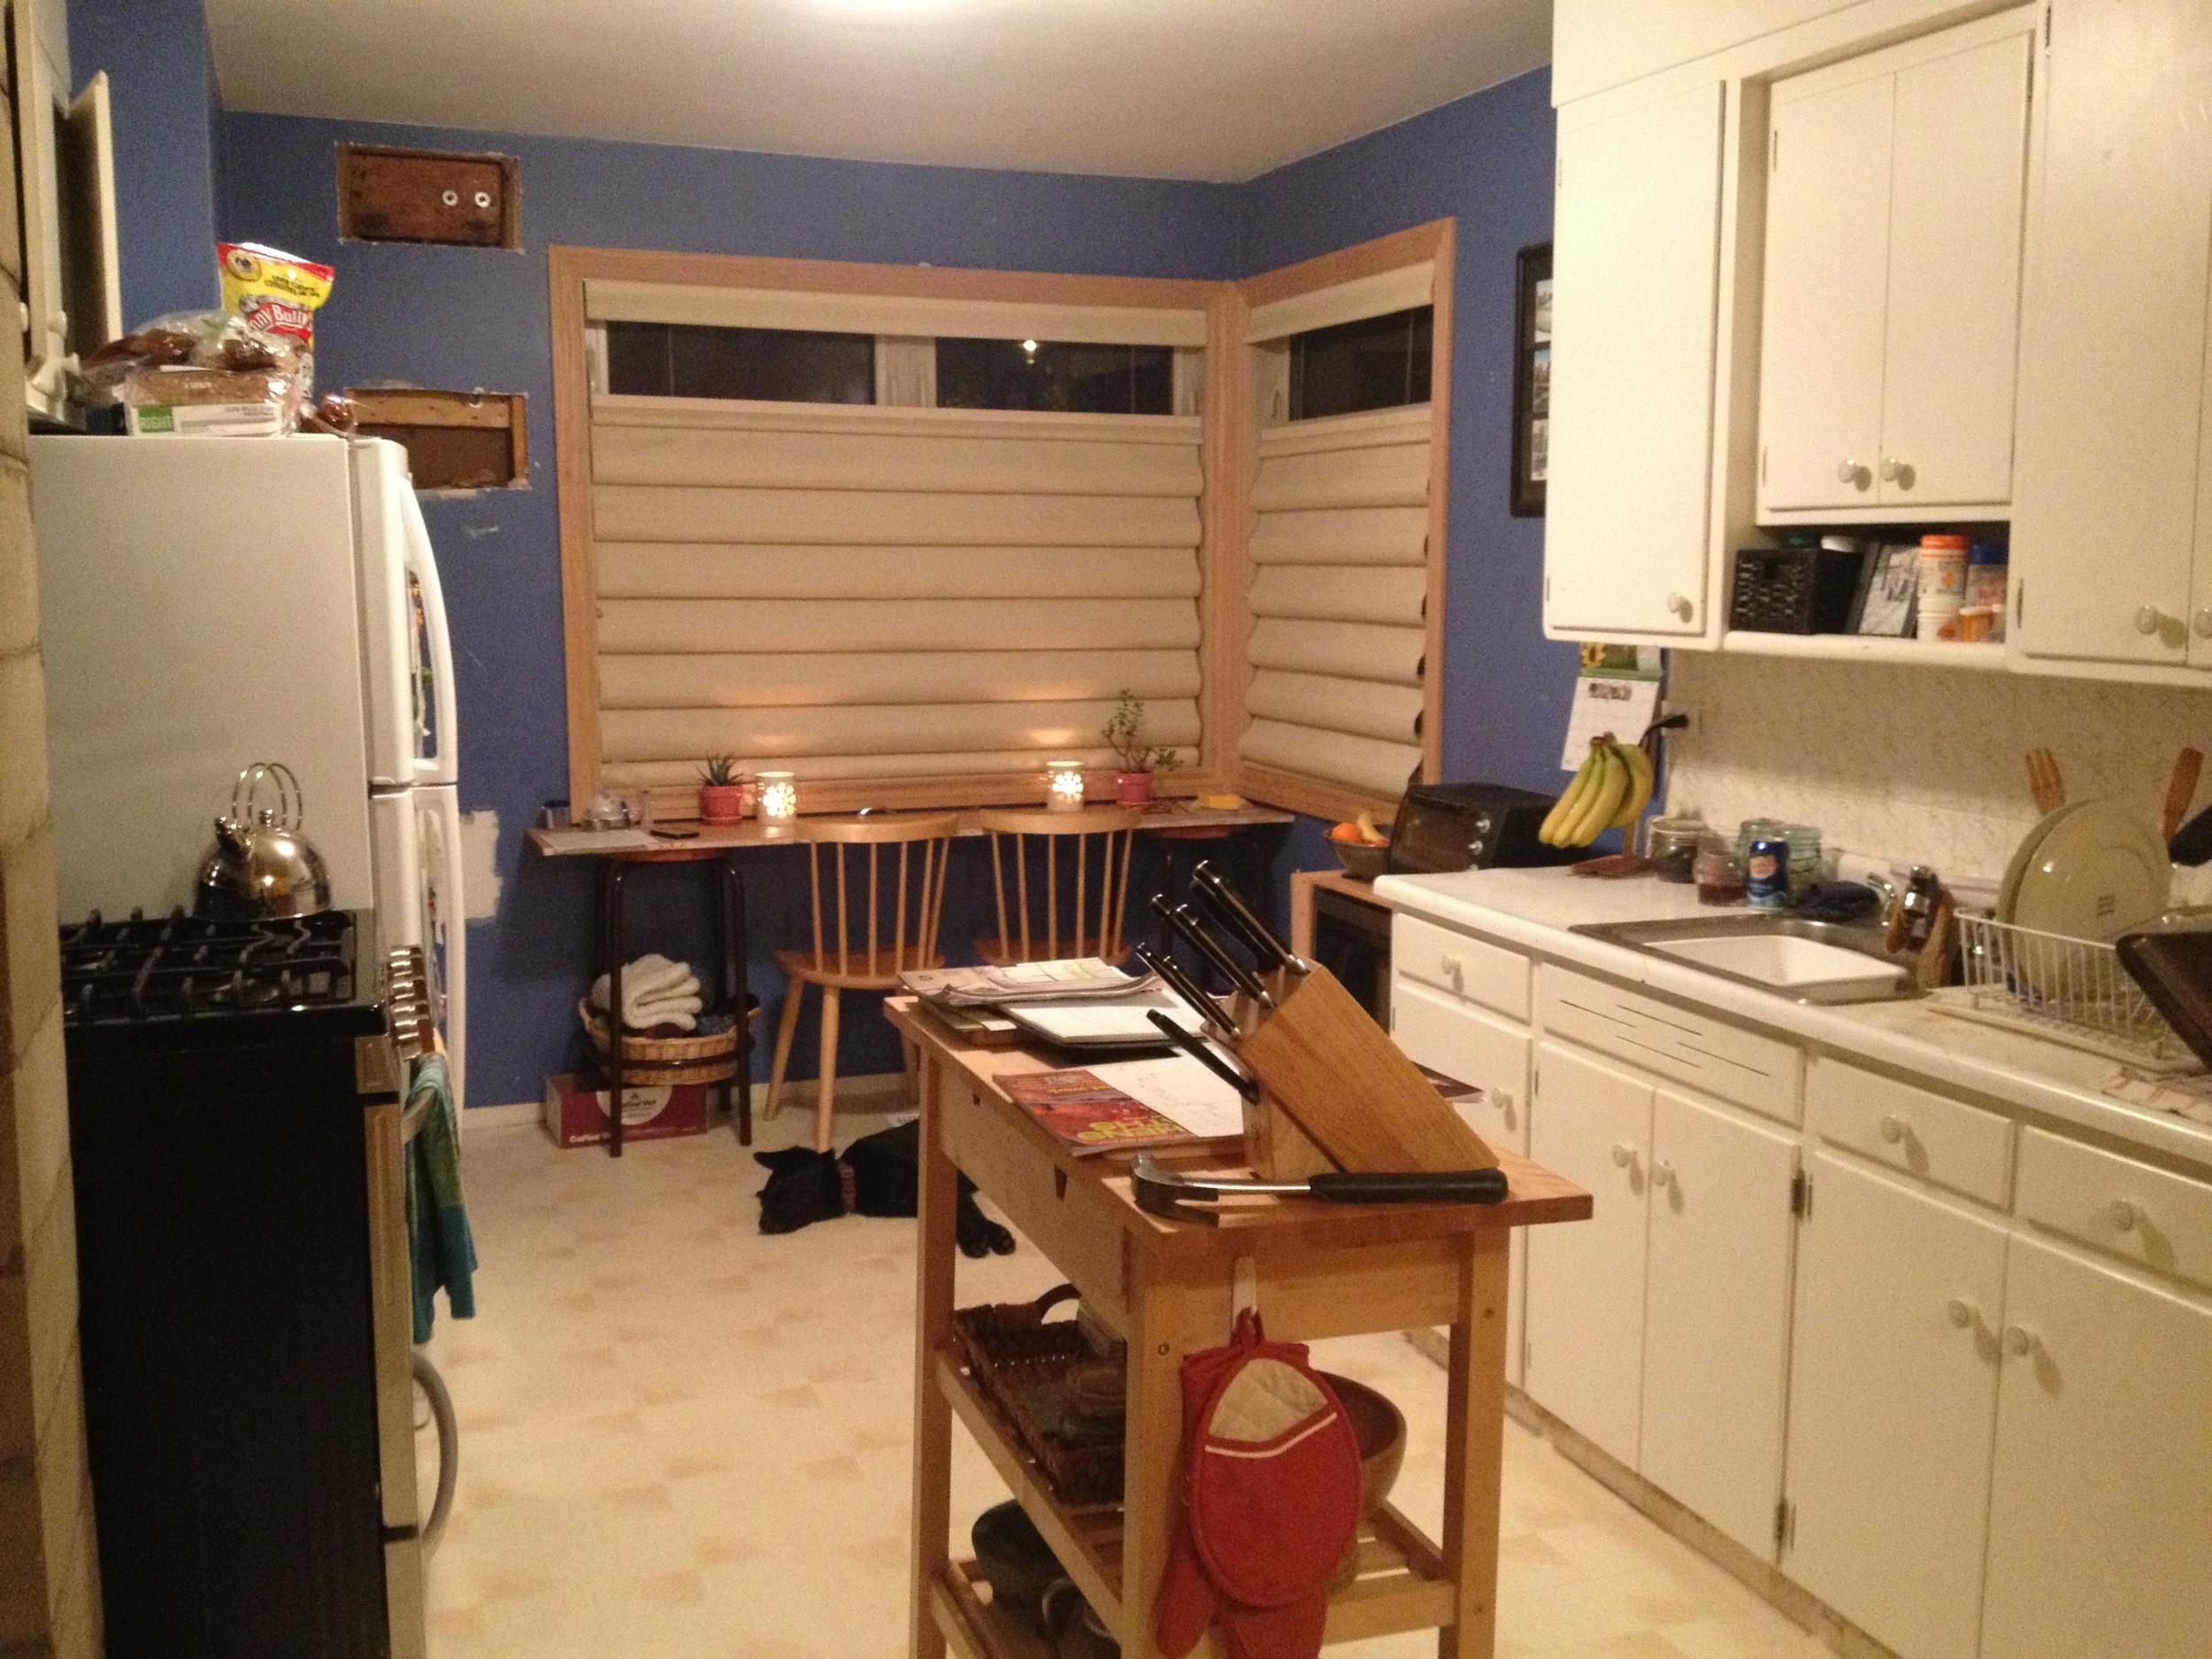 Westmount+Kitchen+Renovation+Before+Cabinets.JPG